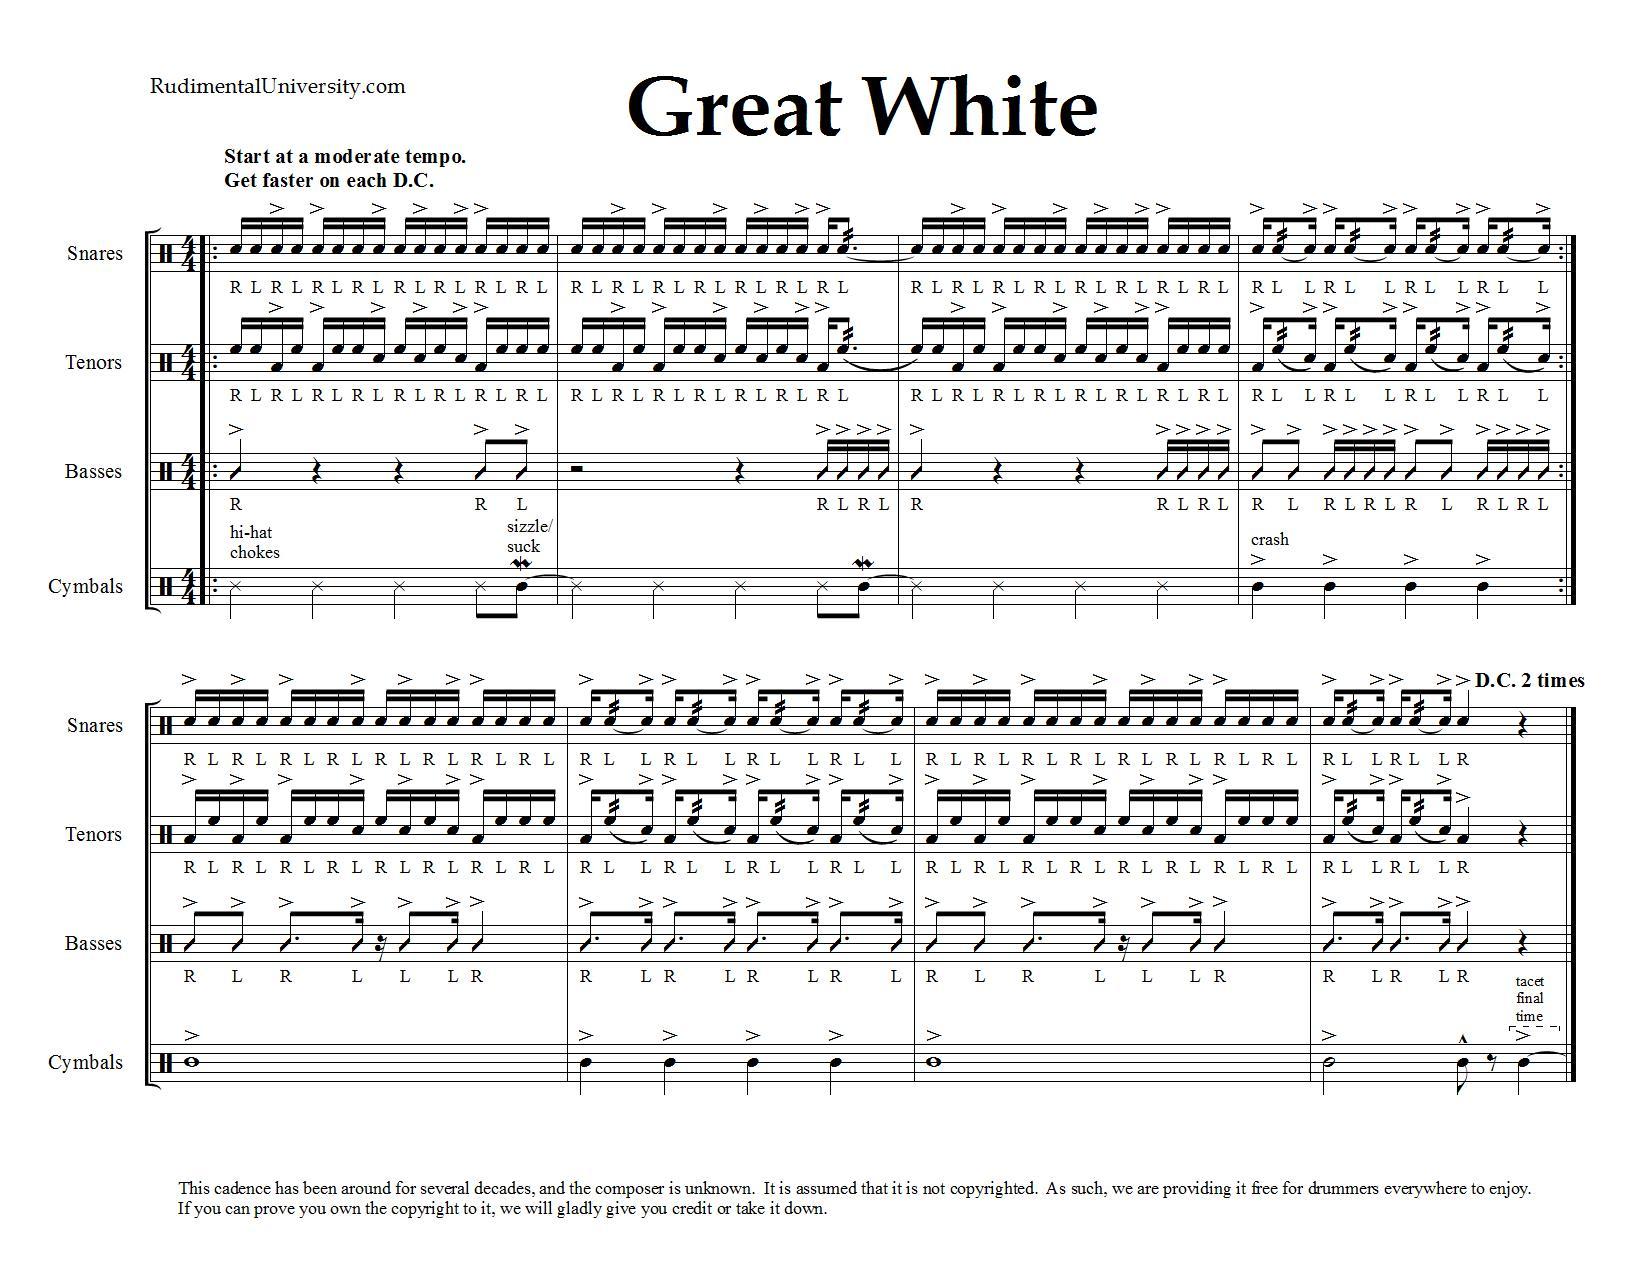 drum line cadences downloadable sheet music rudimental university